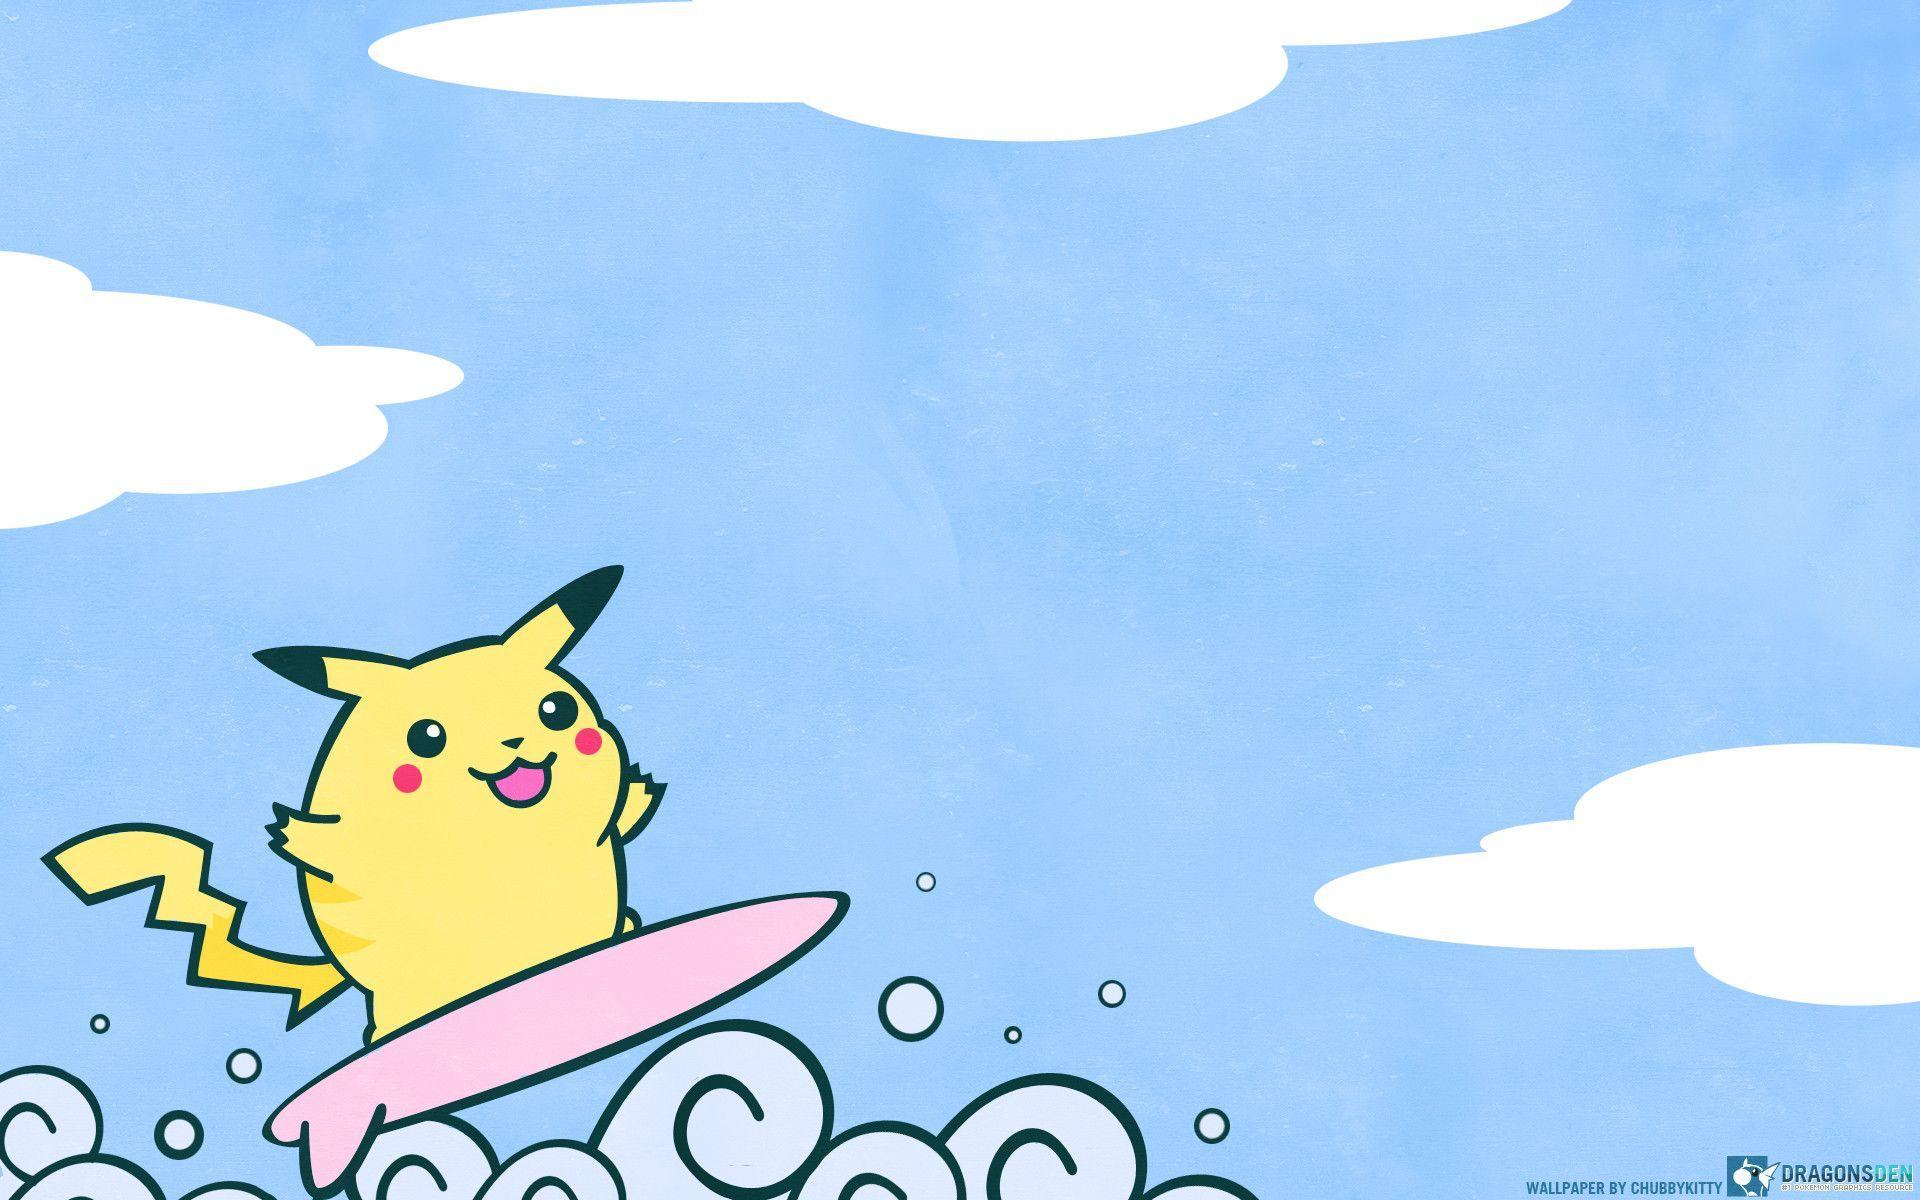 Pokemon Wallpaper Cute Pikhacu Image Wallpaper Basic Background Pokemon Backgrounds Cute Pokemon Wallpaper Pikachu Wallpaper